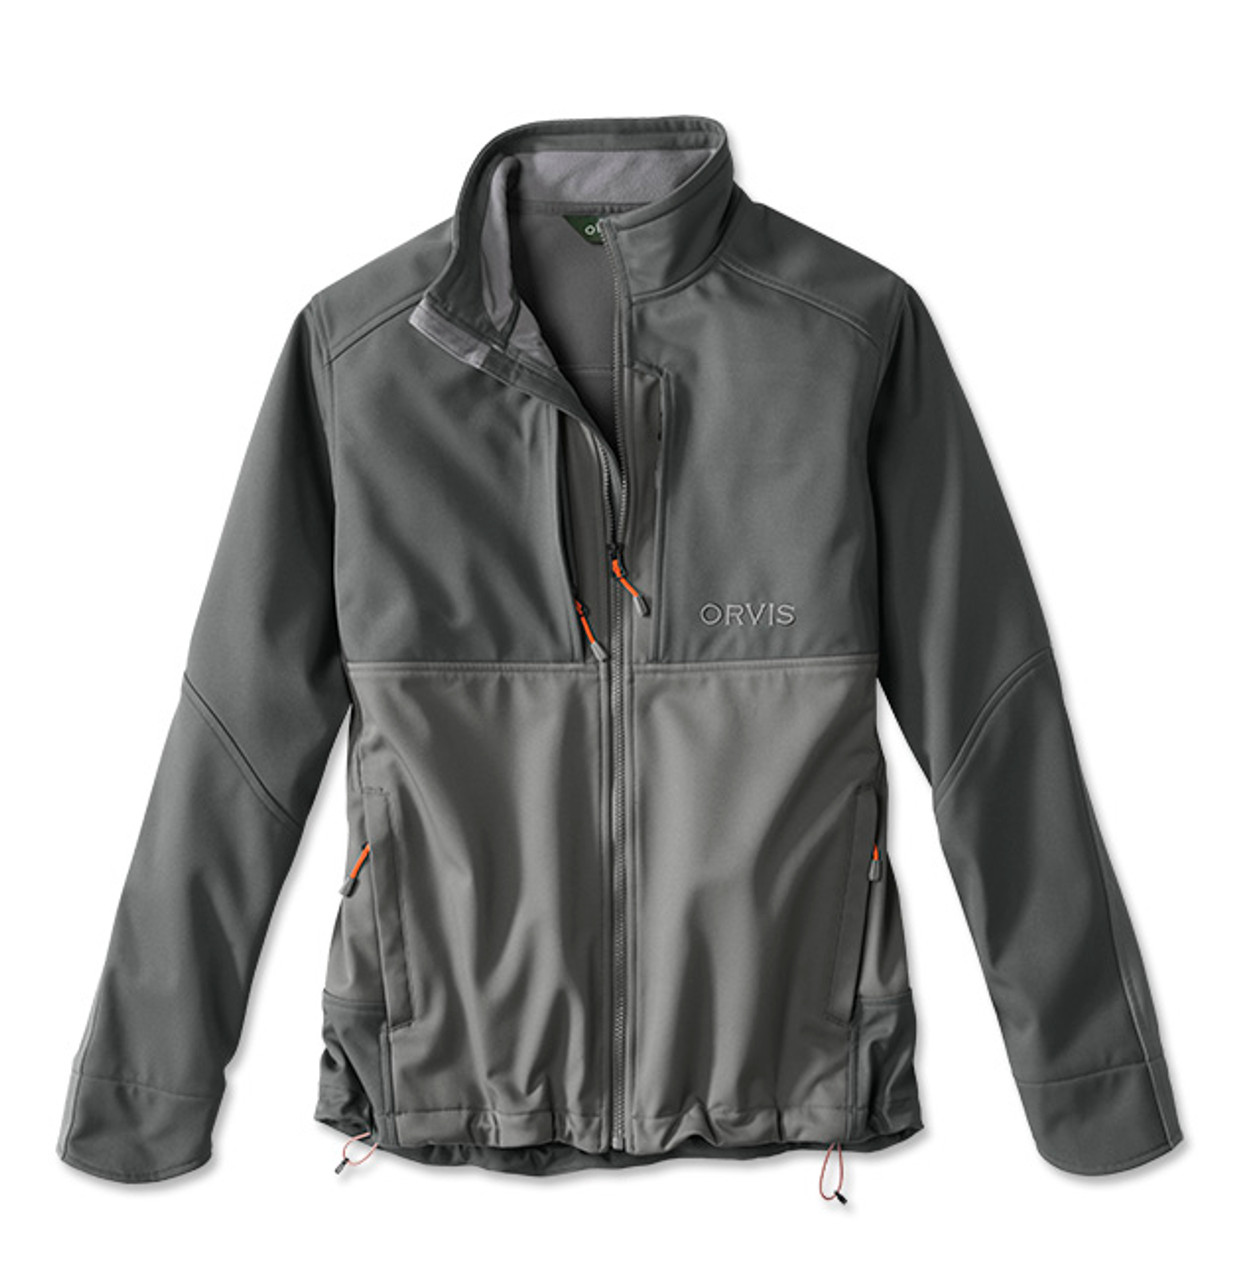 Orvis Softshell Upland Hunting Jacket 2P6B